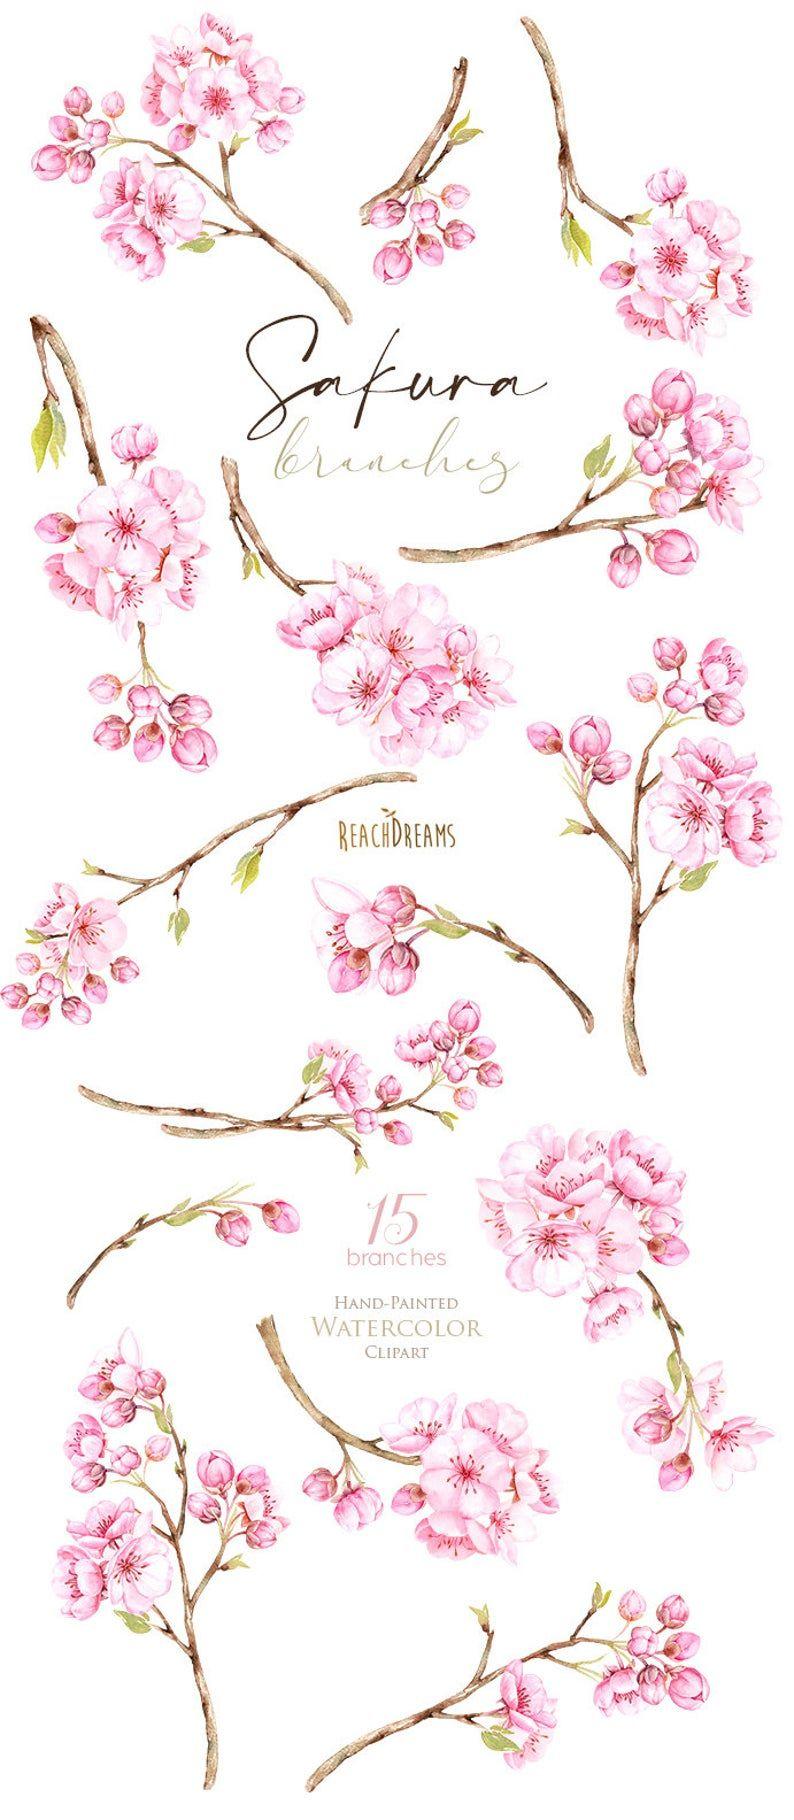 Sakura Branches Watercolor Floral Clipart Cherry Blossom Etsy Cherry Blossom Watercolor Cherry Blossom Drawing Floral Watercolor